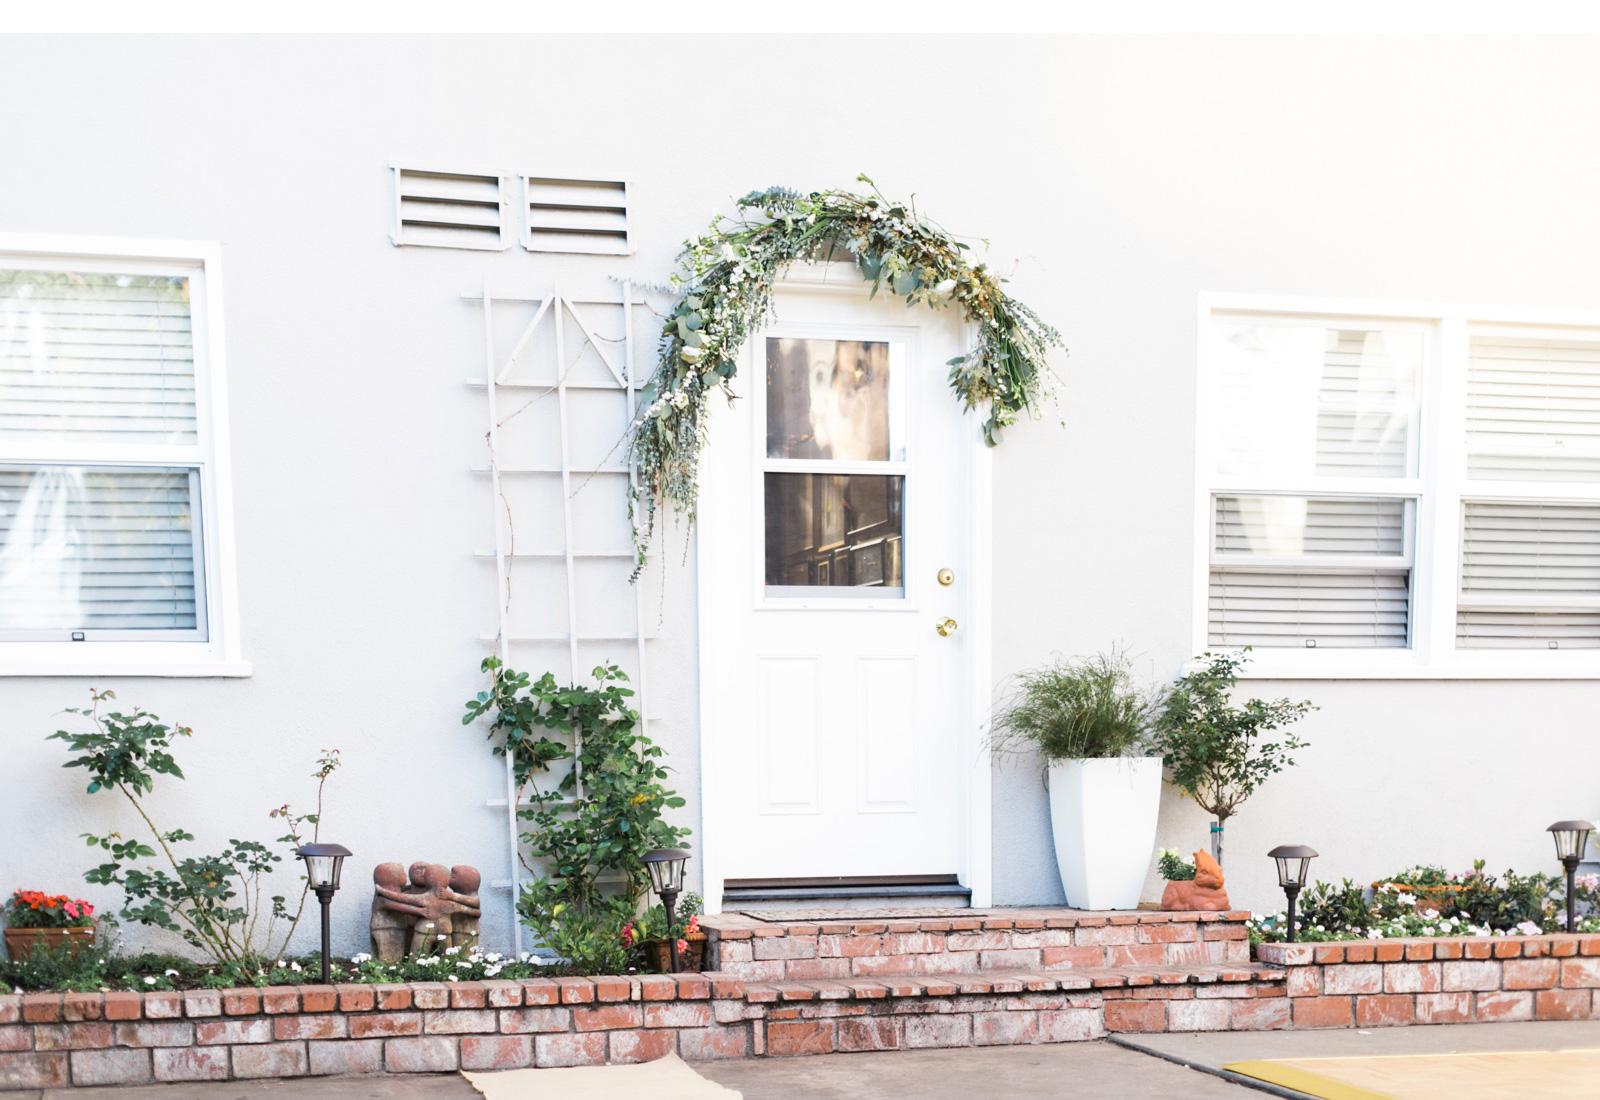 Private-Estate-Backyard-Wedding-Natalie-Schutt-Photography_02.jpg